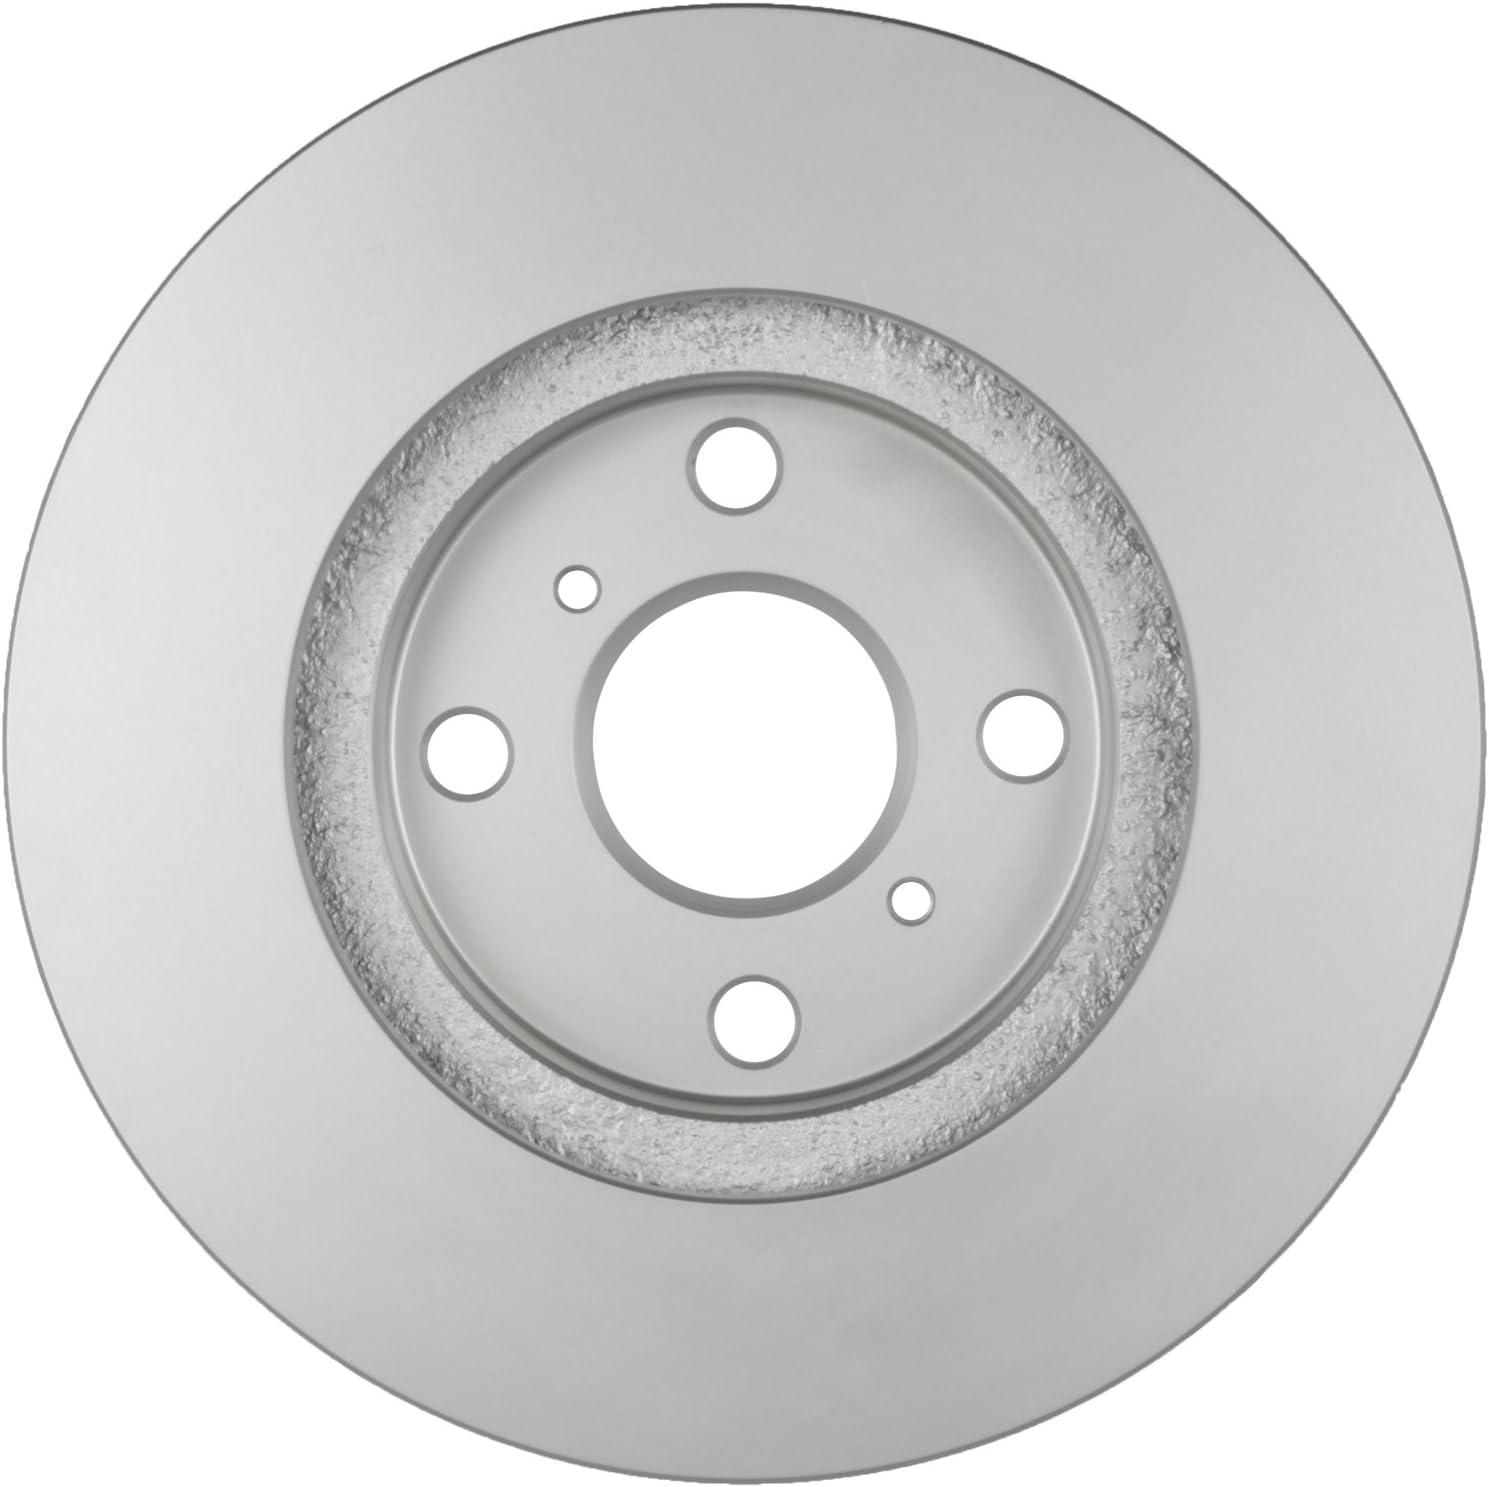 ACDelco 18A1619AC Advantage Disc Brake Rotor